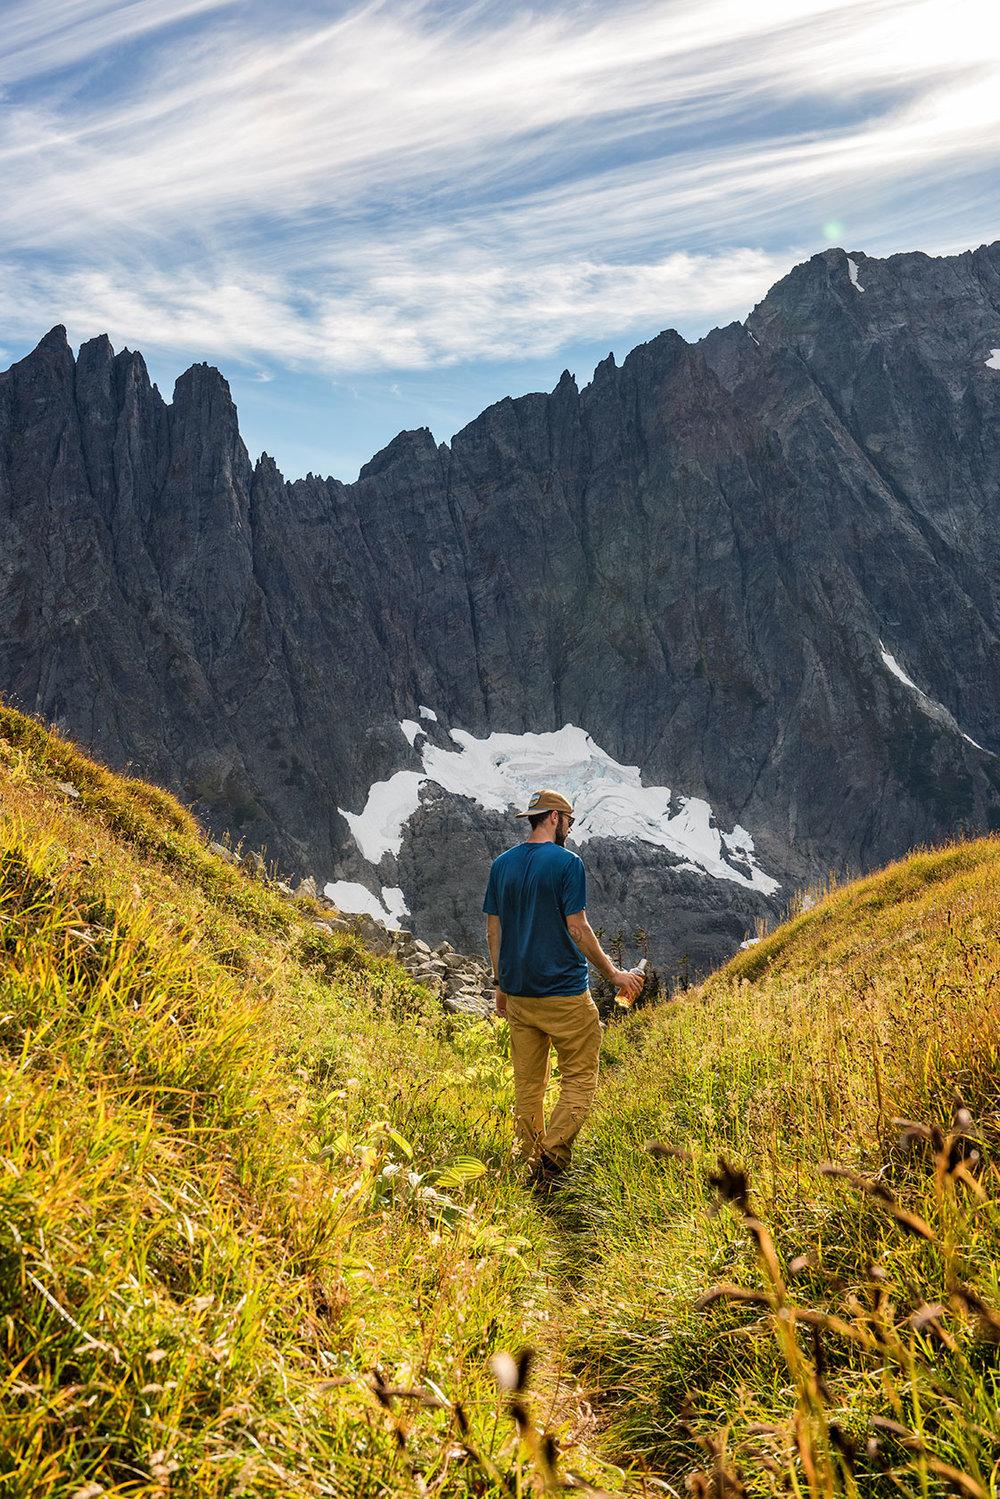 austin-trigg-whiskey-lifestyle-washington-sahale-arm-north-cascades-hiking.jpg